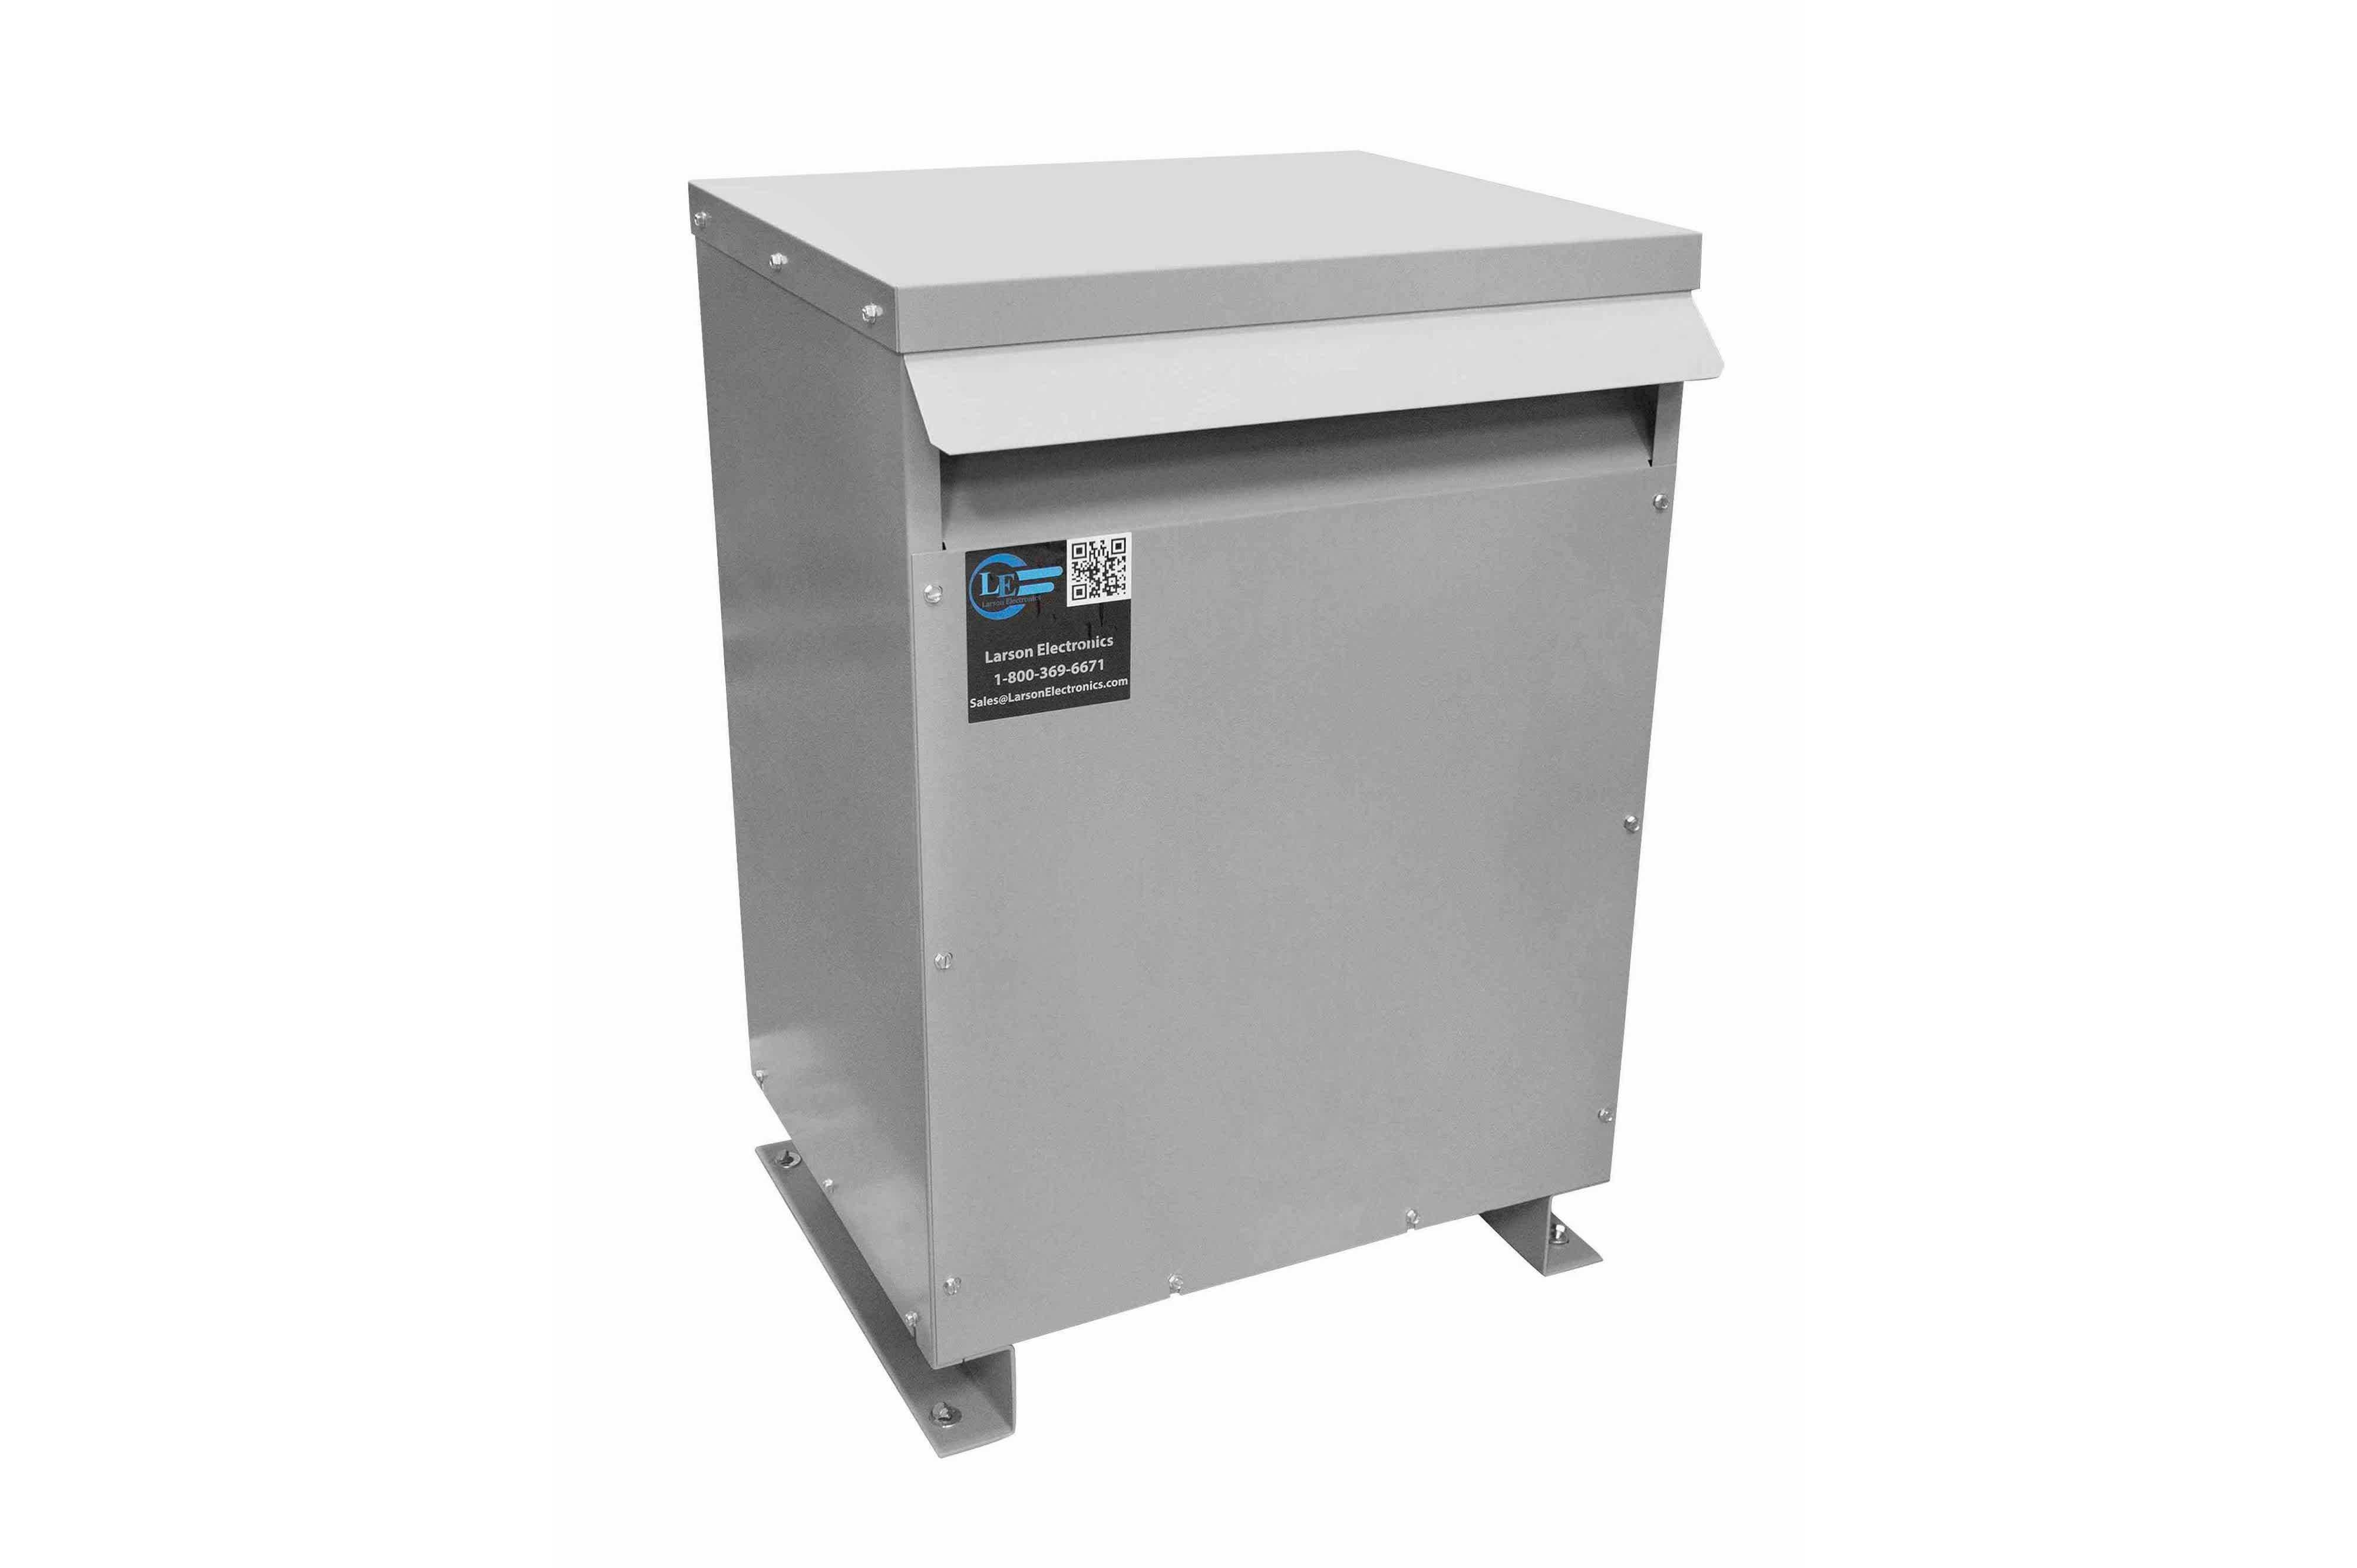 11 kVA 3PH Isolation Transformer, 220V Wye Primary, 208Y/120 Wye-N Secondary, N3R, Ventilated, 60 Hz